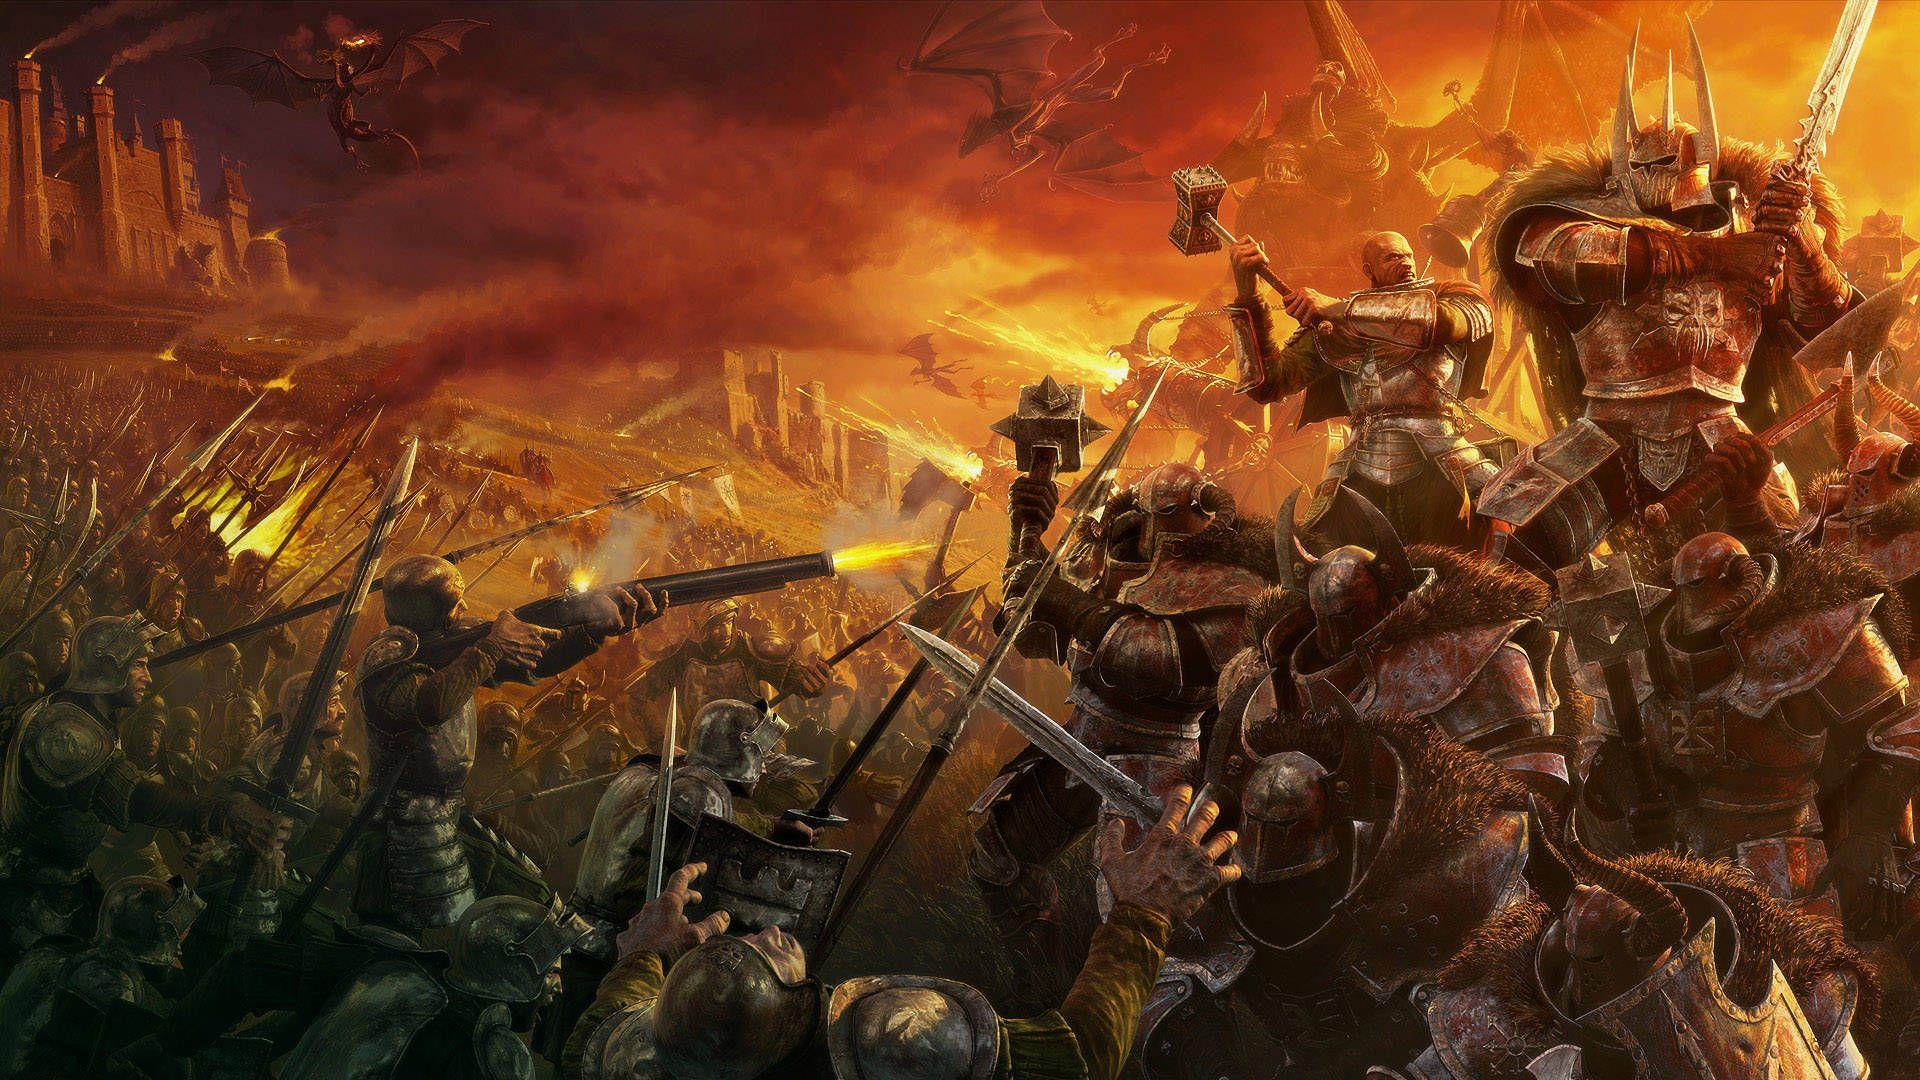 Fantasy Battlefields Wallpaper Art Collection Part 1 Fantasy Art Warriors Wallpaper Fantasy Pictures